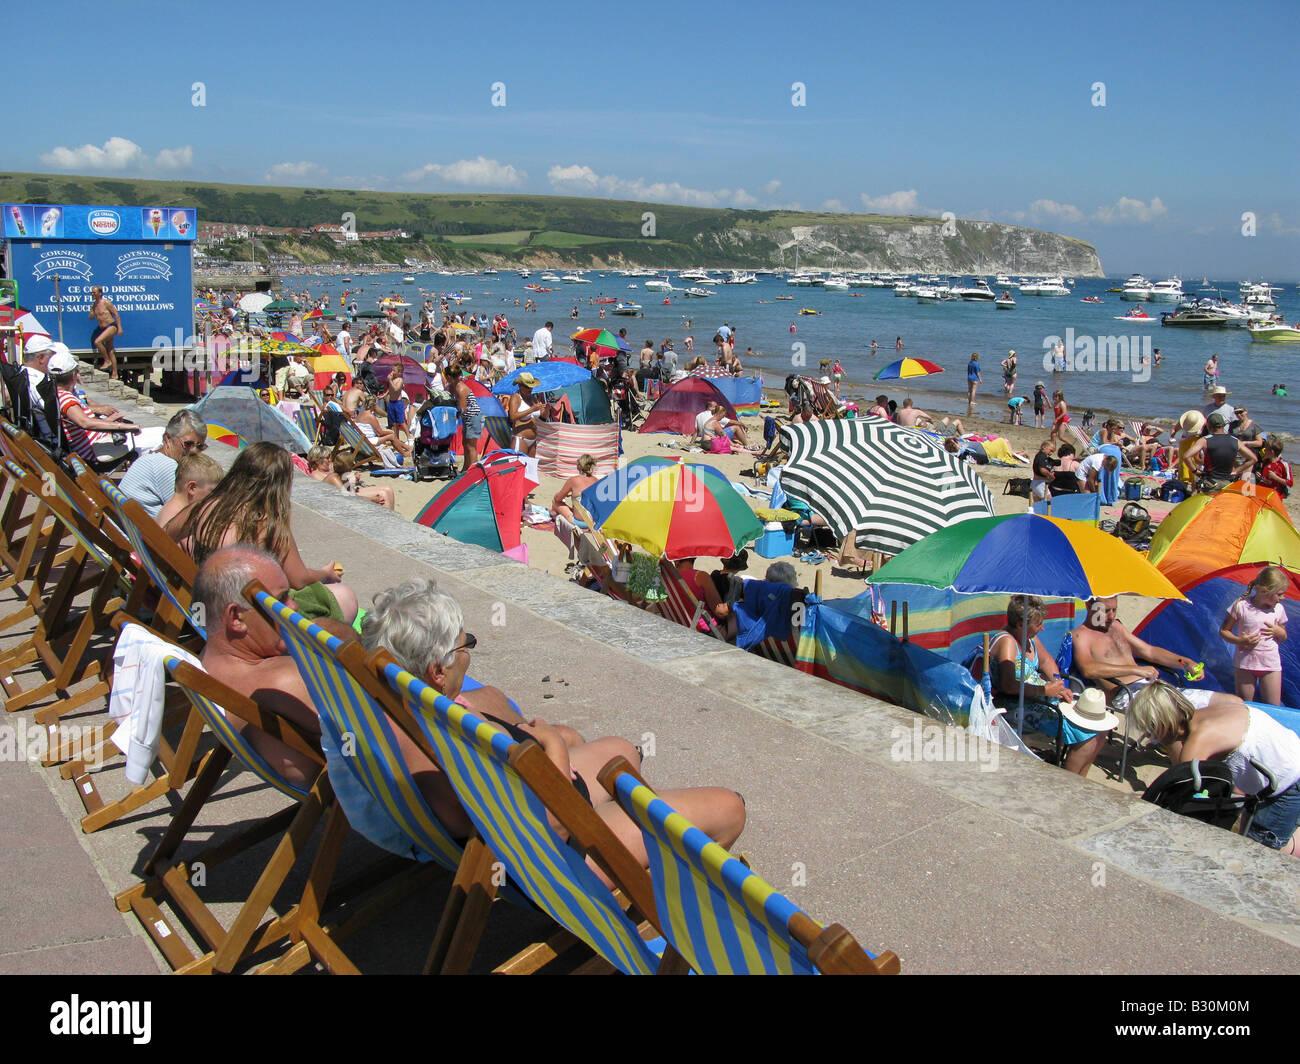 Crowded beach at Swanage, Isle of Purbeck, Dorset, England, Great Britain, United Kingdom, UK, Europe - Stock Image